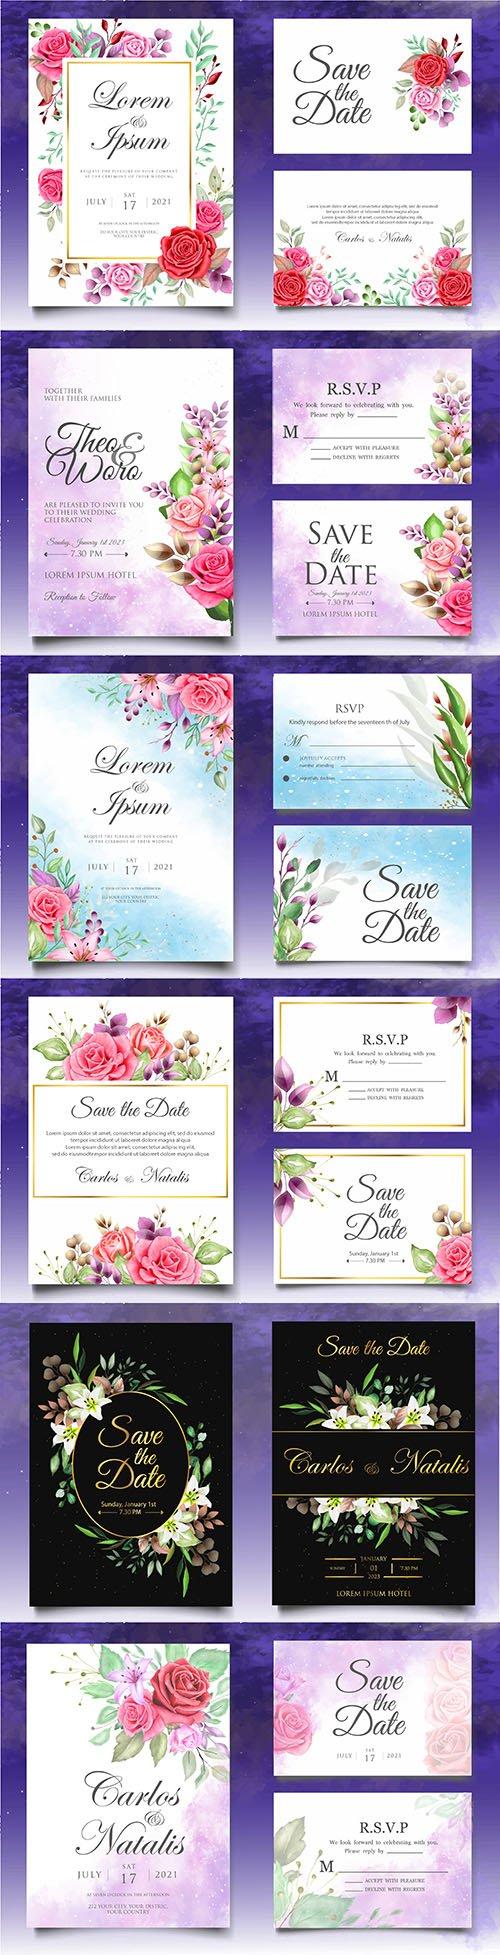 Beautiful watercolor floral template wedding invitation